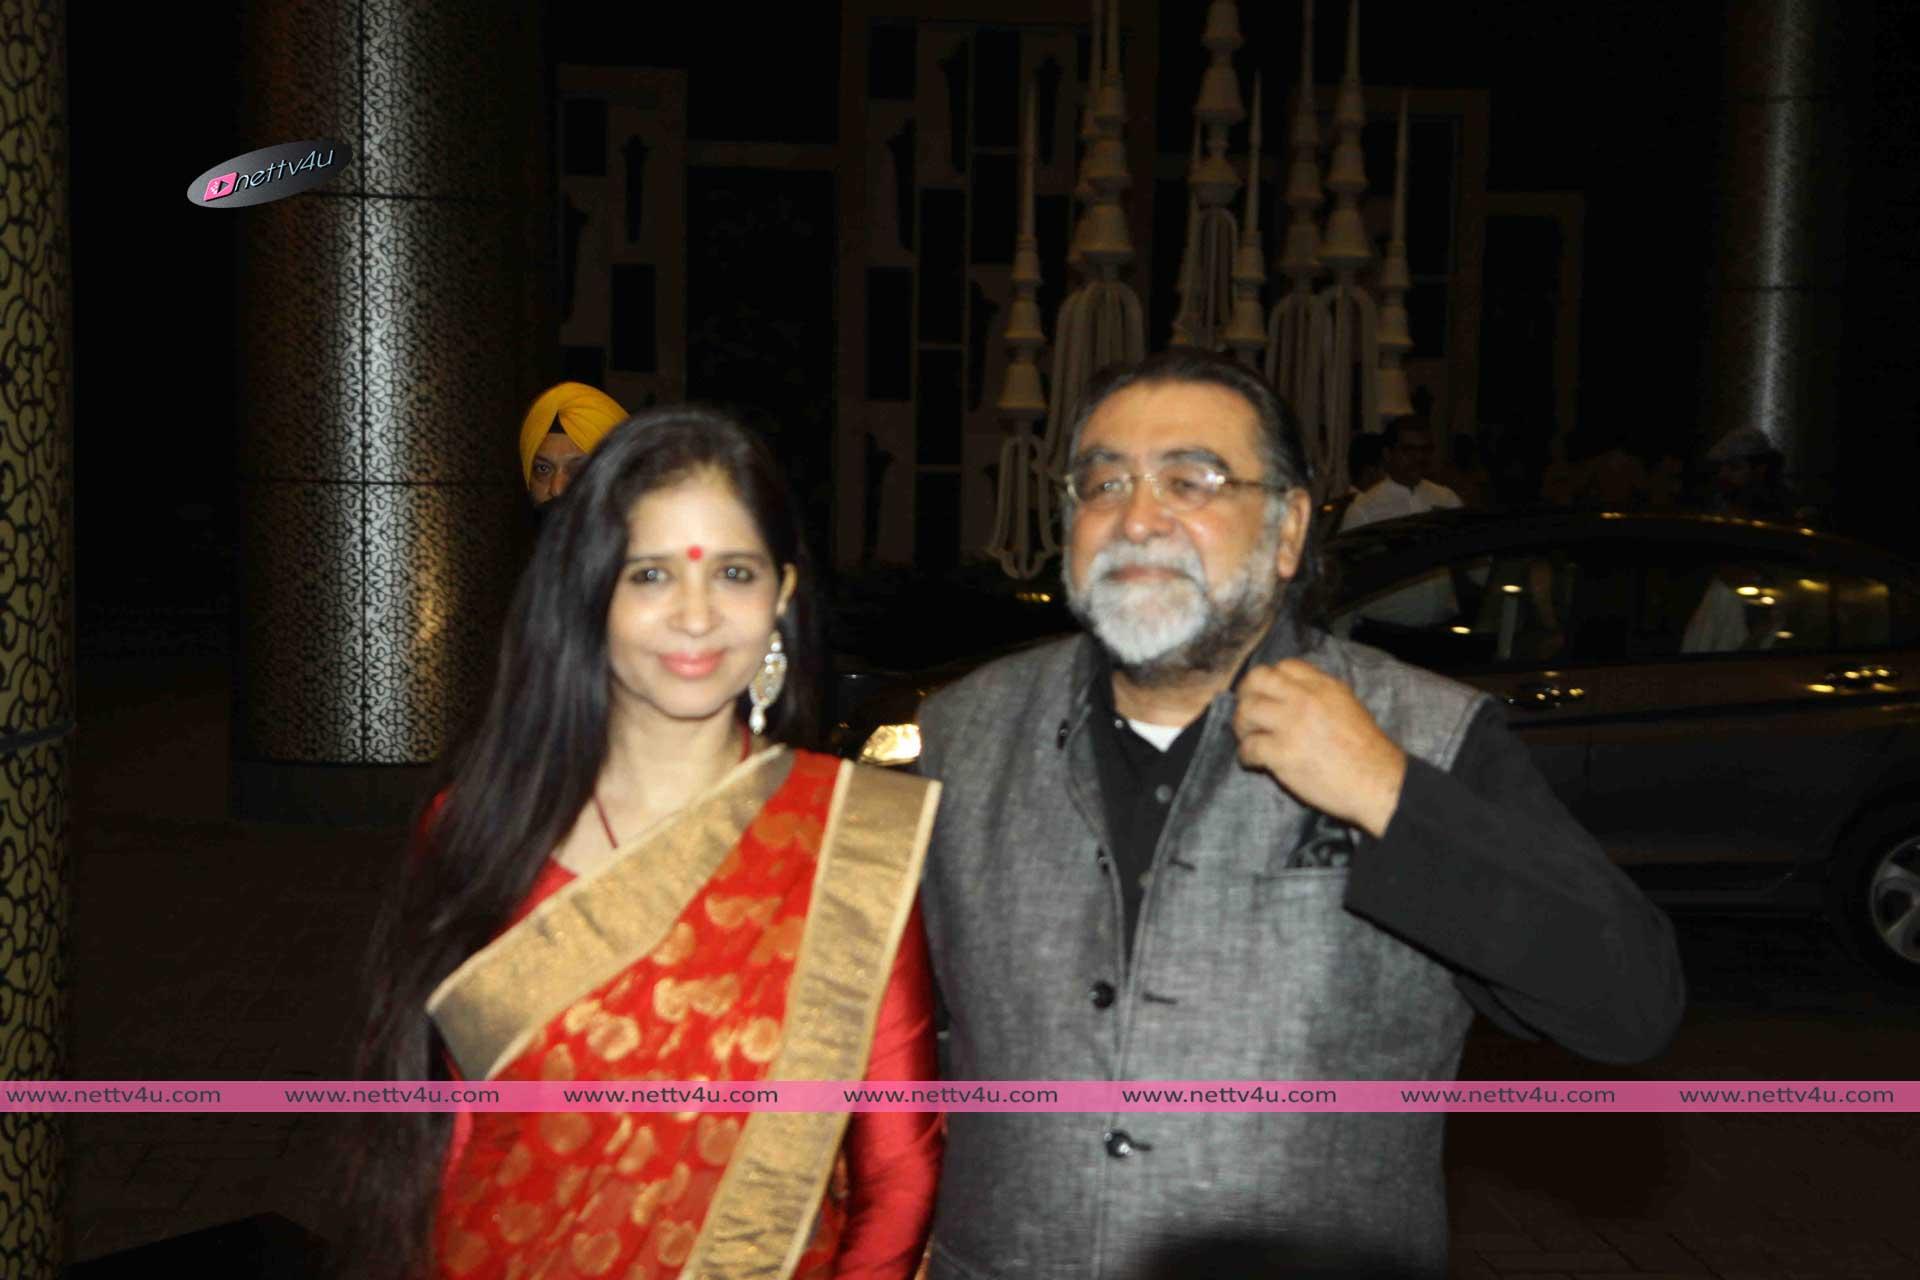 wedding reception of shahid a mira 1 01